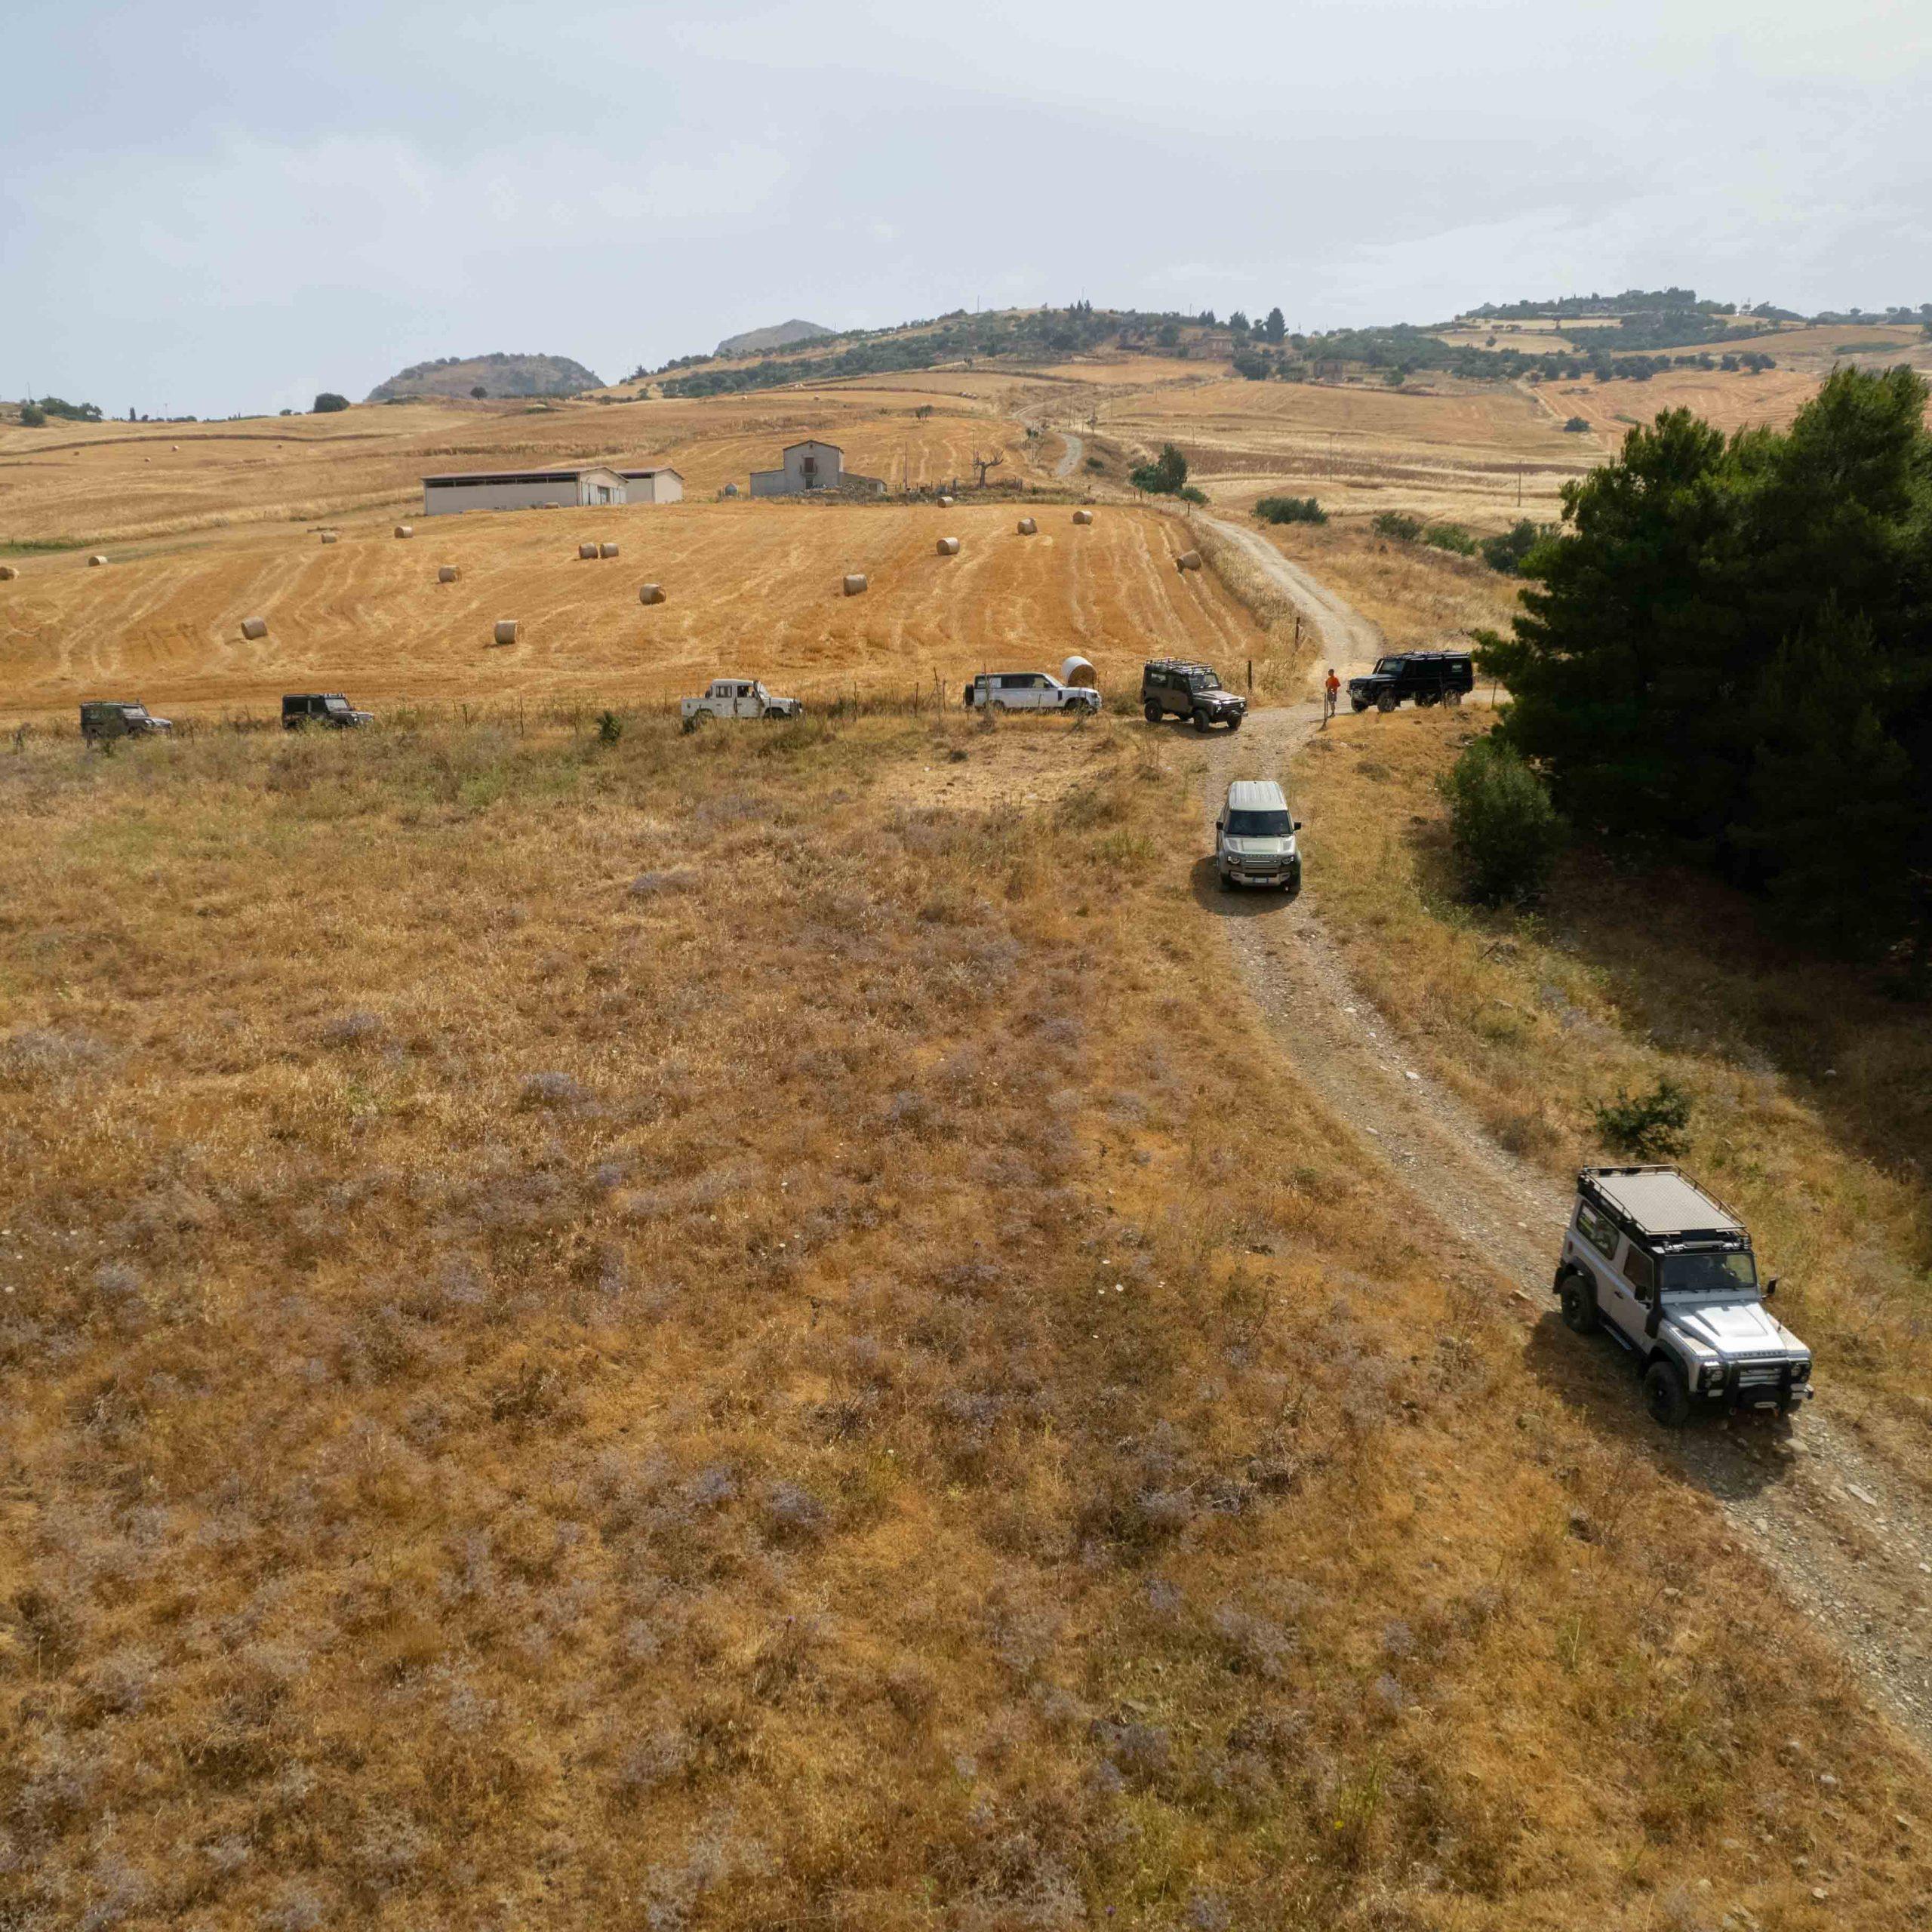 Land_Rover_Tour_Sicilia_2021_Land_Rover_Experience_Italia_-21